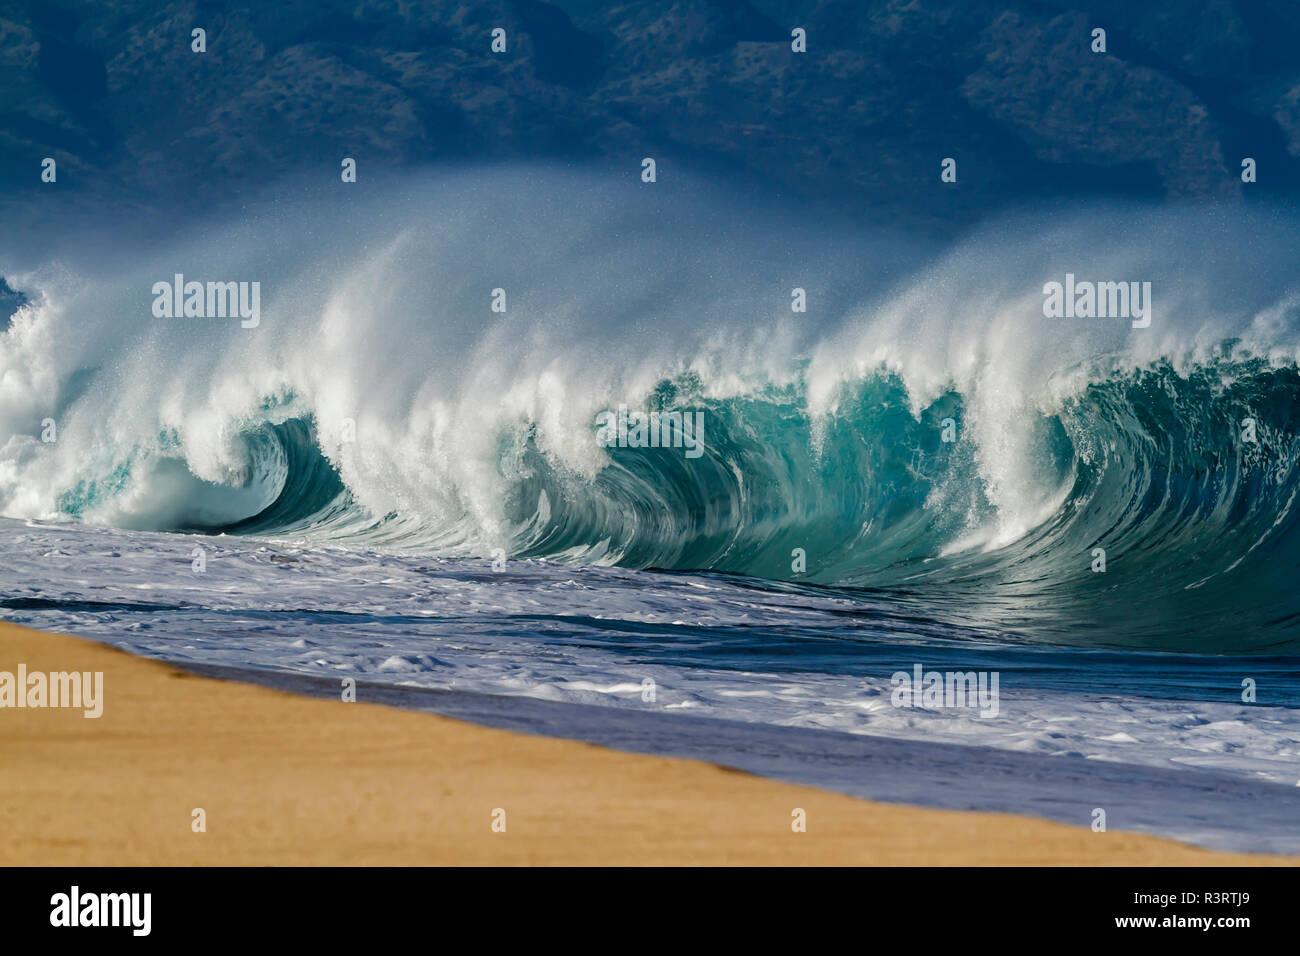 Keiki Beach Stock Photos & Keiki Beach Stock Images - Alamy